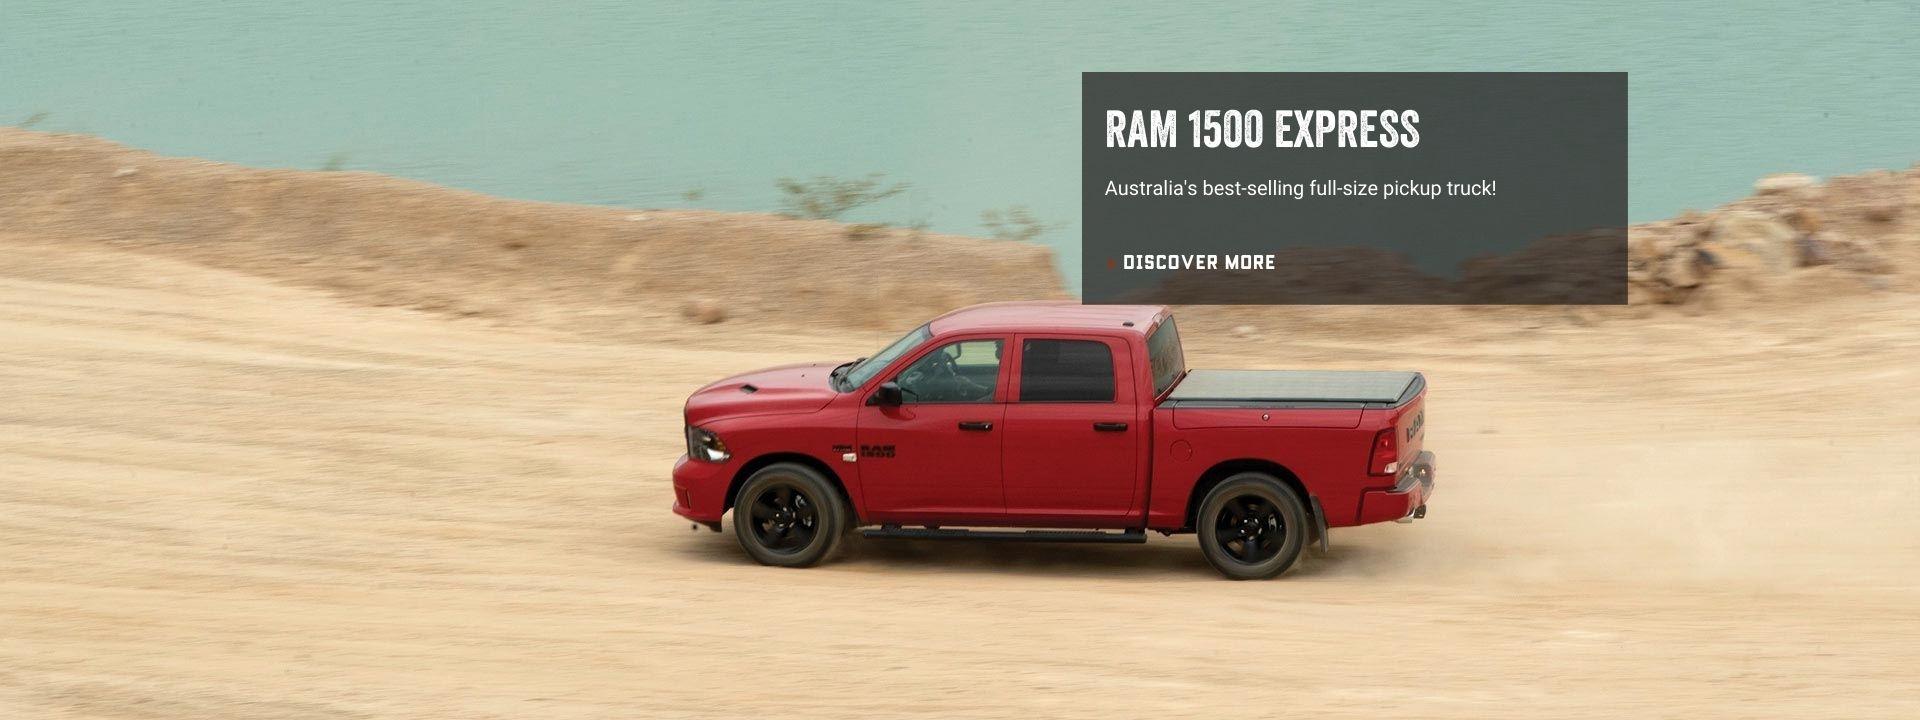 DC Motors Ram The New Ram 1500